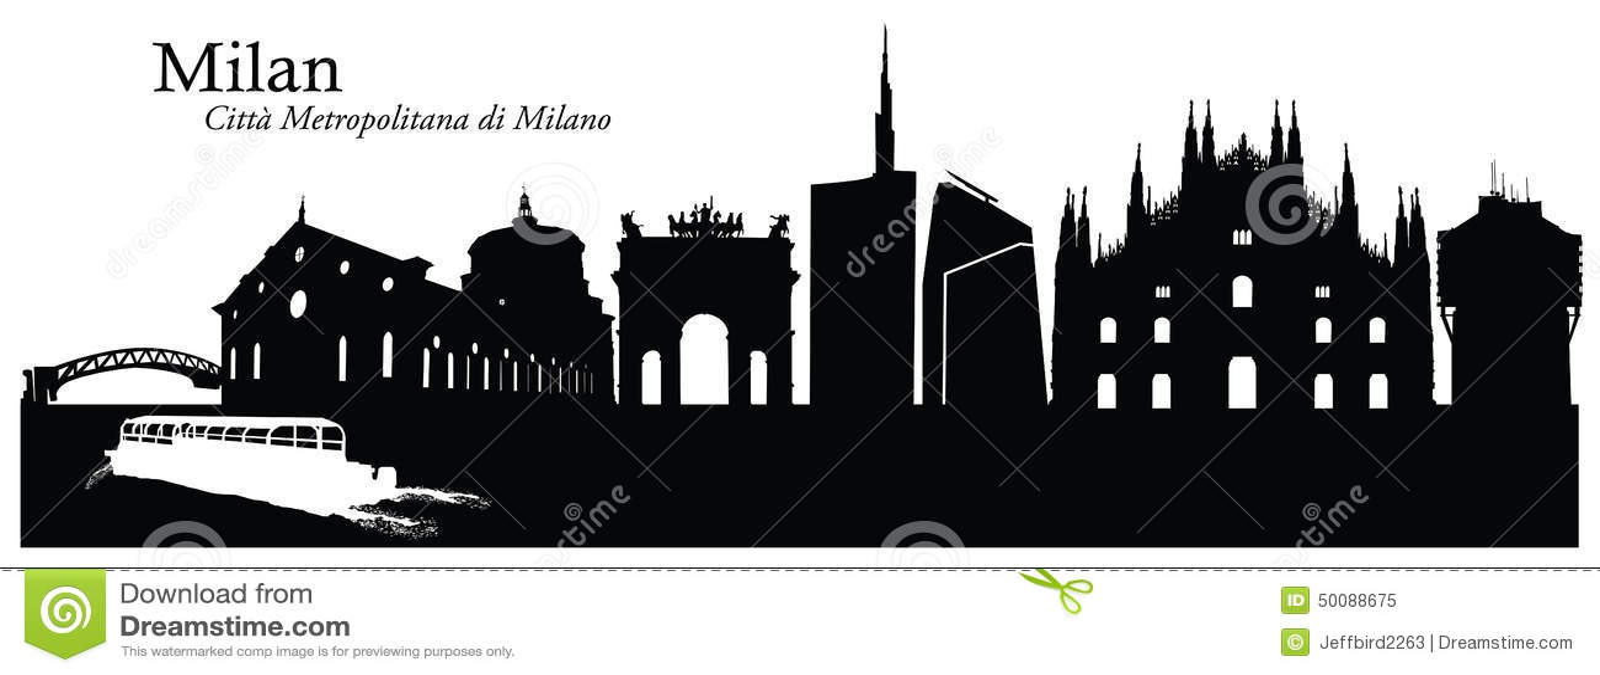 vector illustration of milan cityscape skyline stock chicago skyline vector download chicago skyline vector download